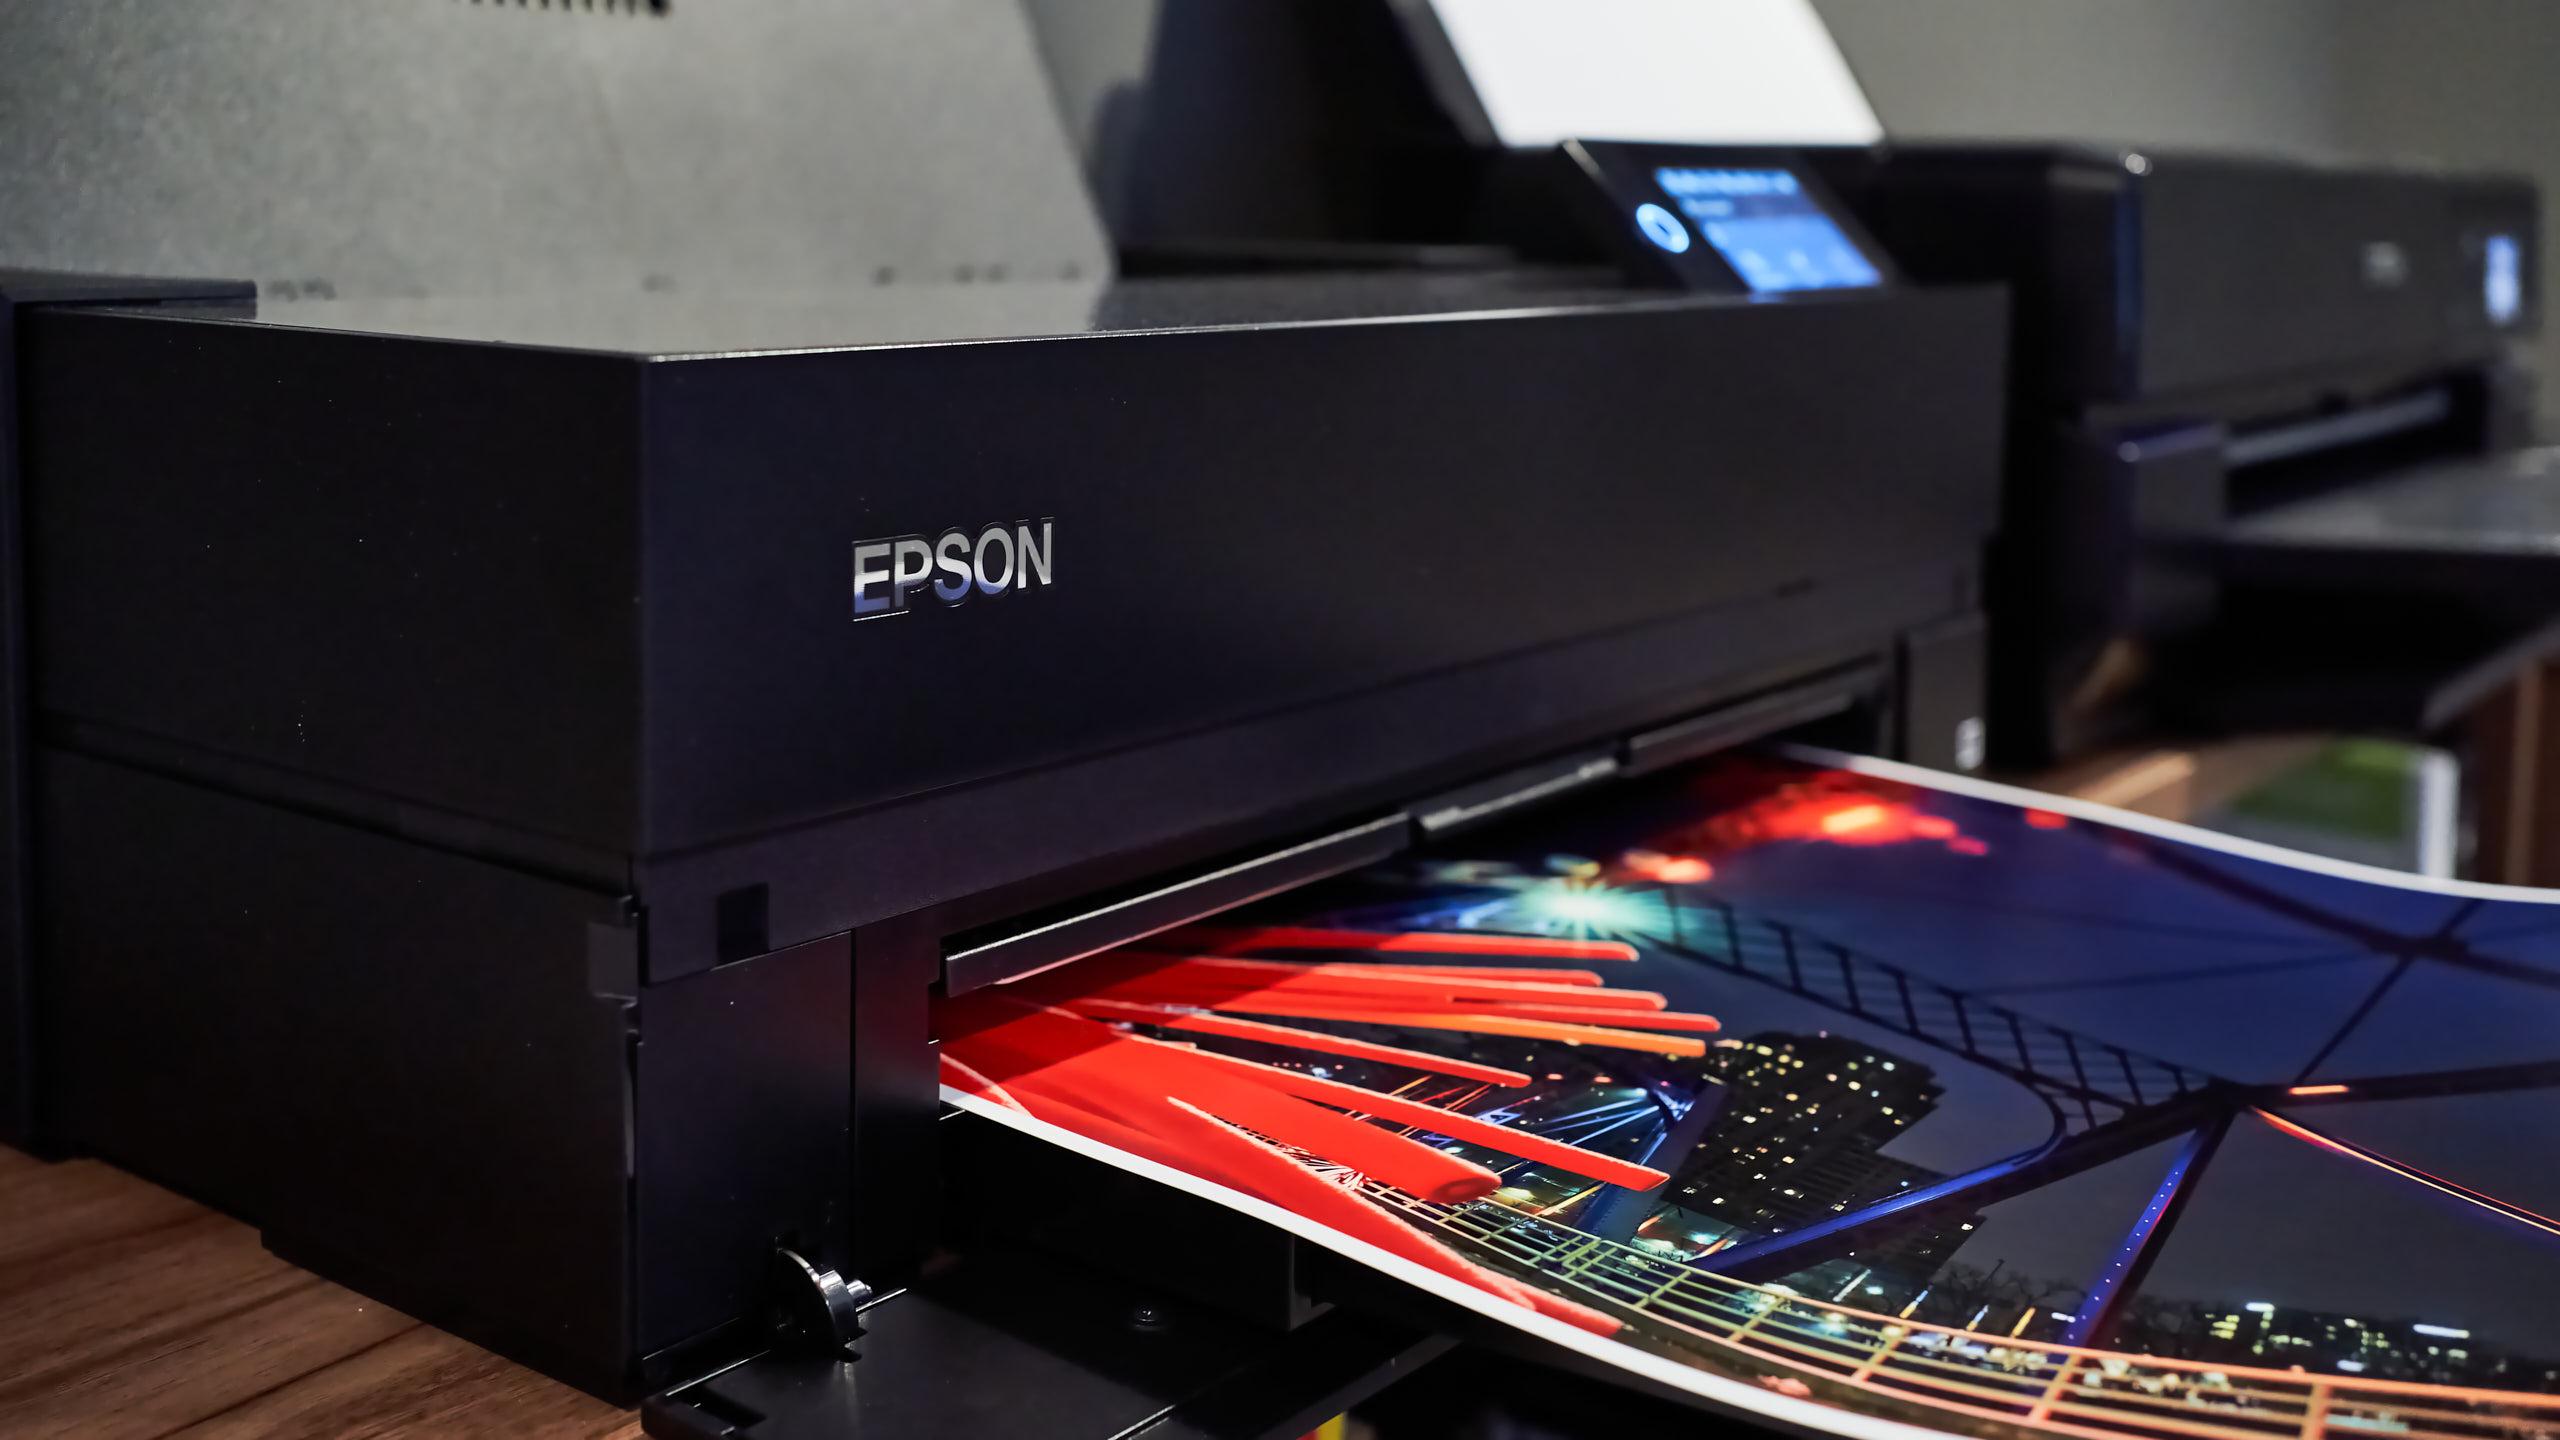 Epson-P900-015